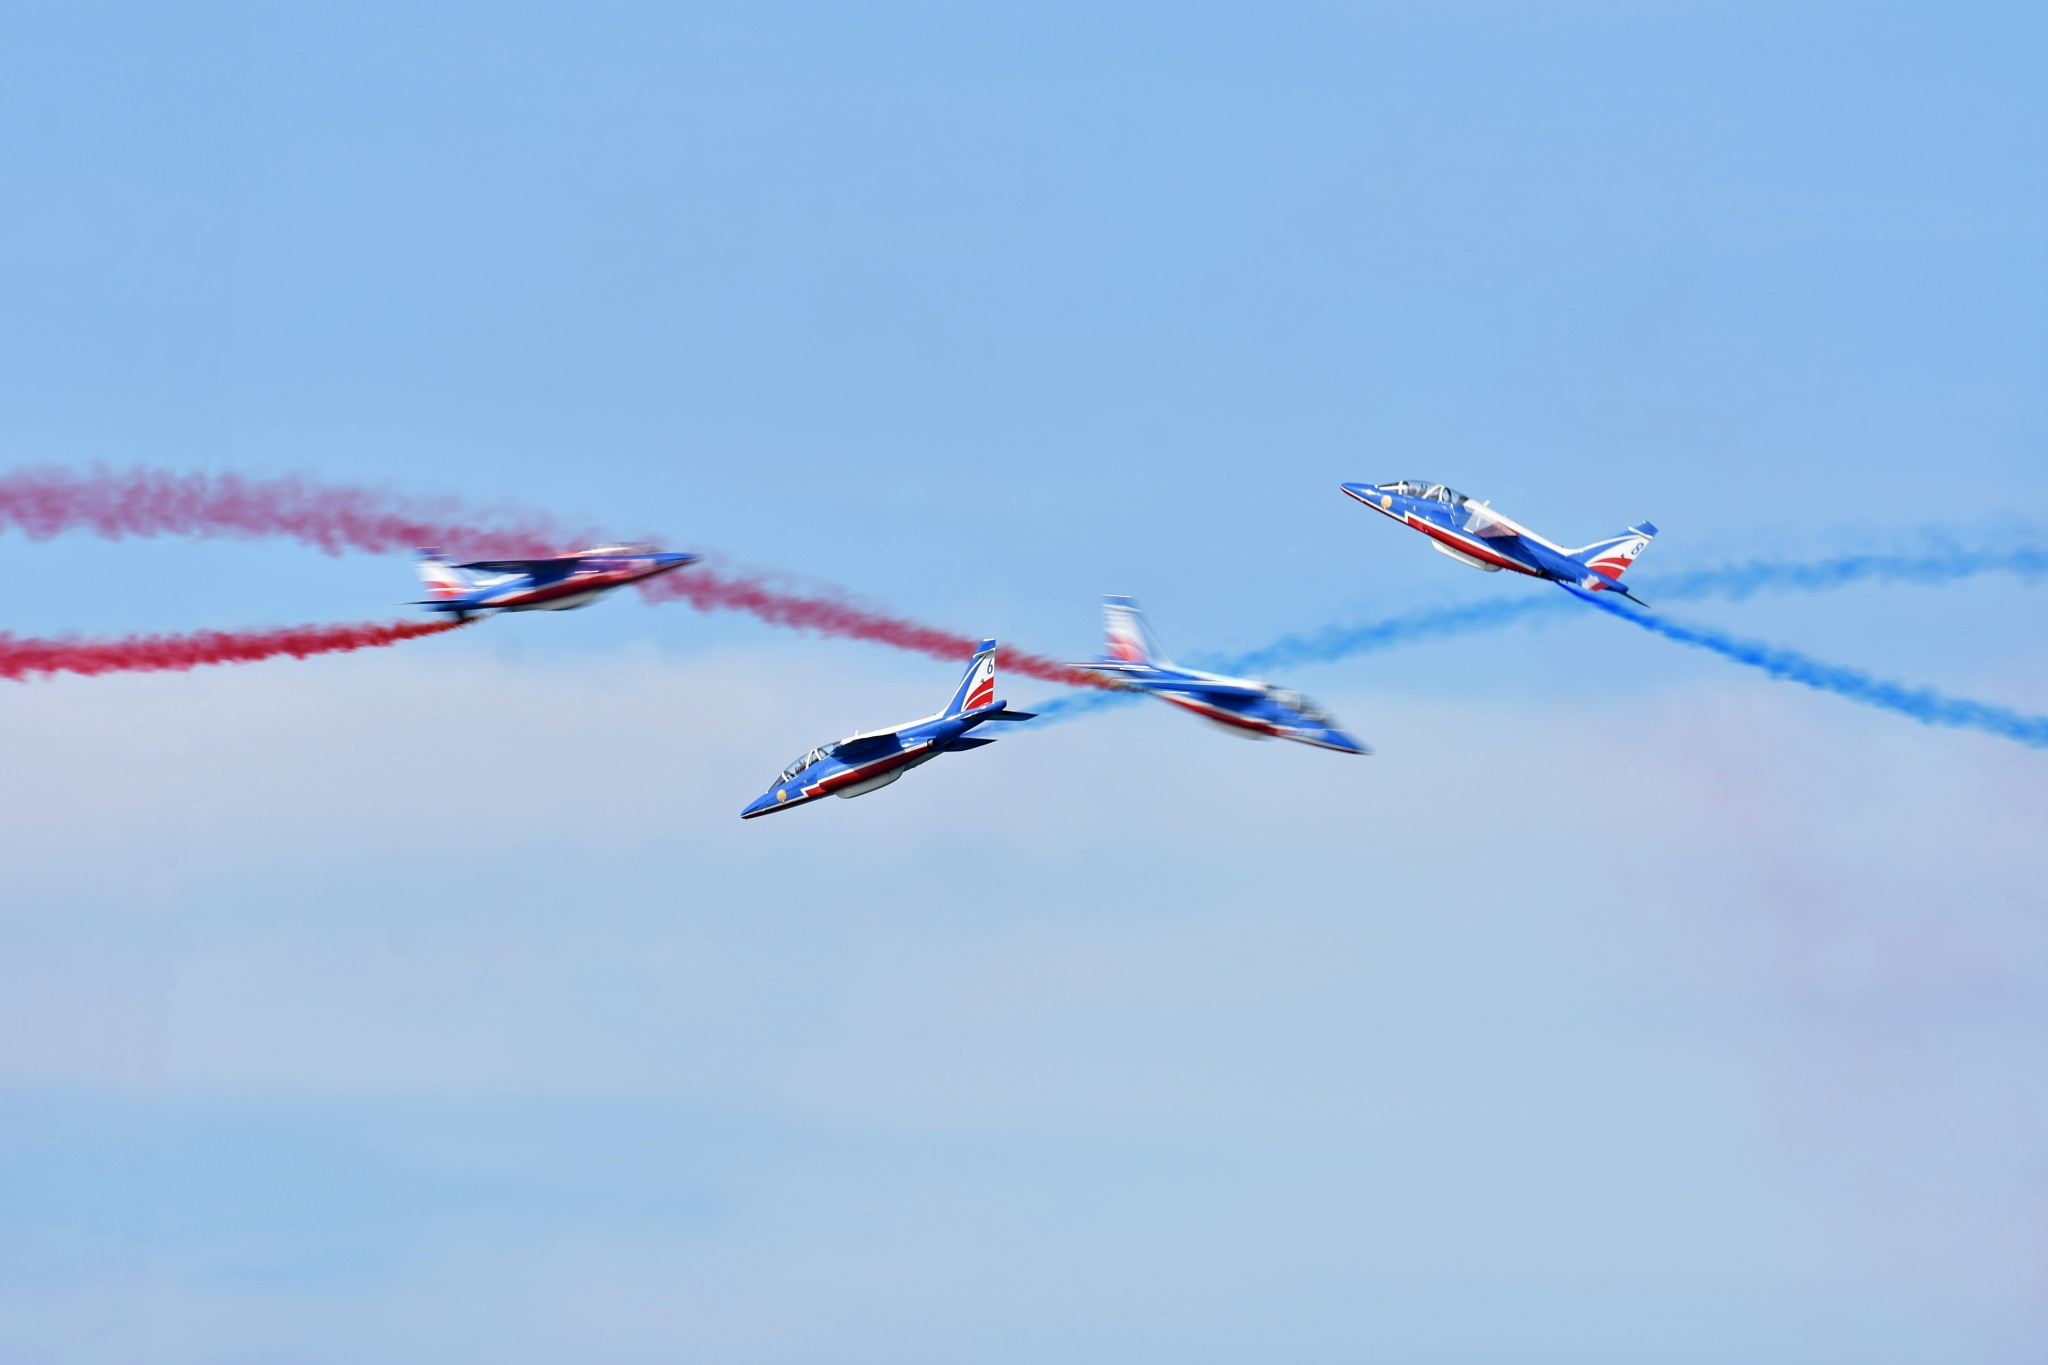 Air Show by Nicola Nik Mazzini